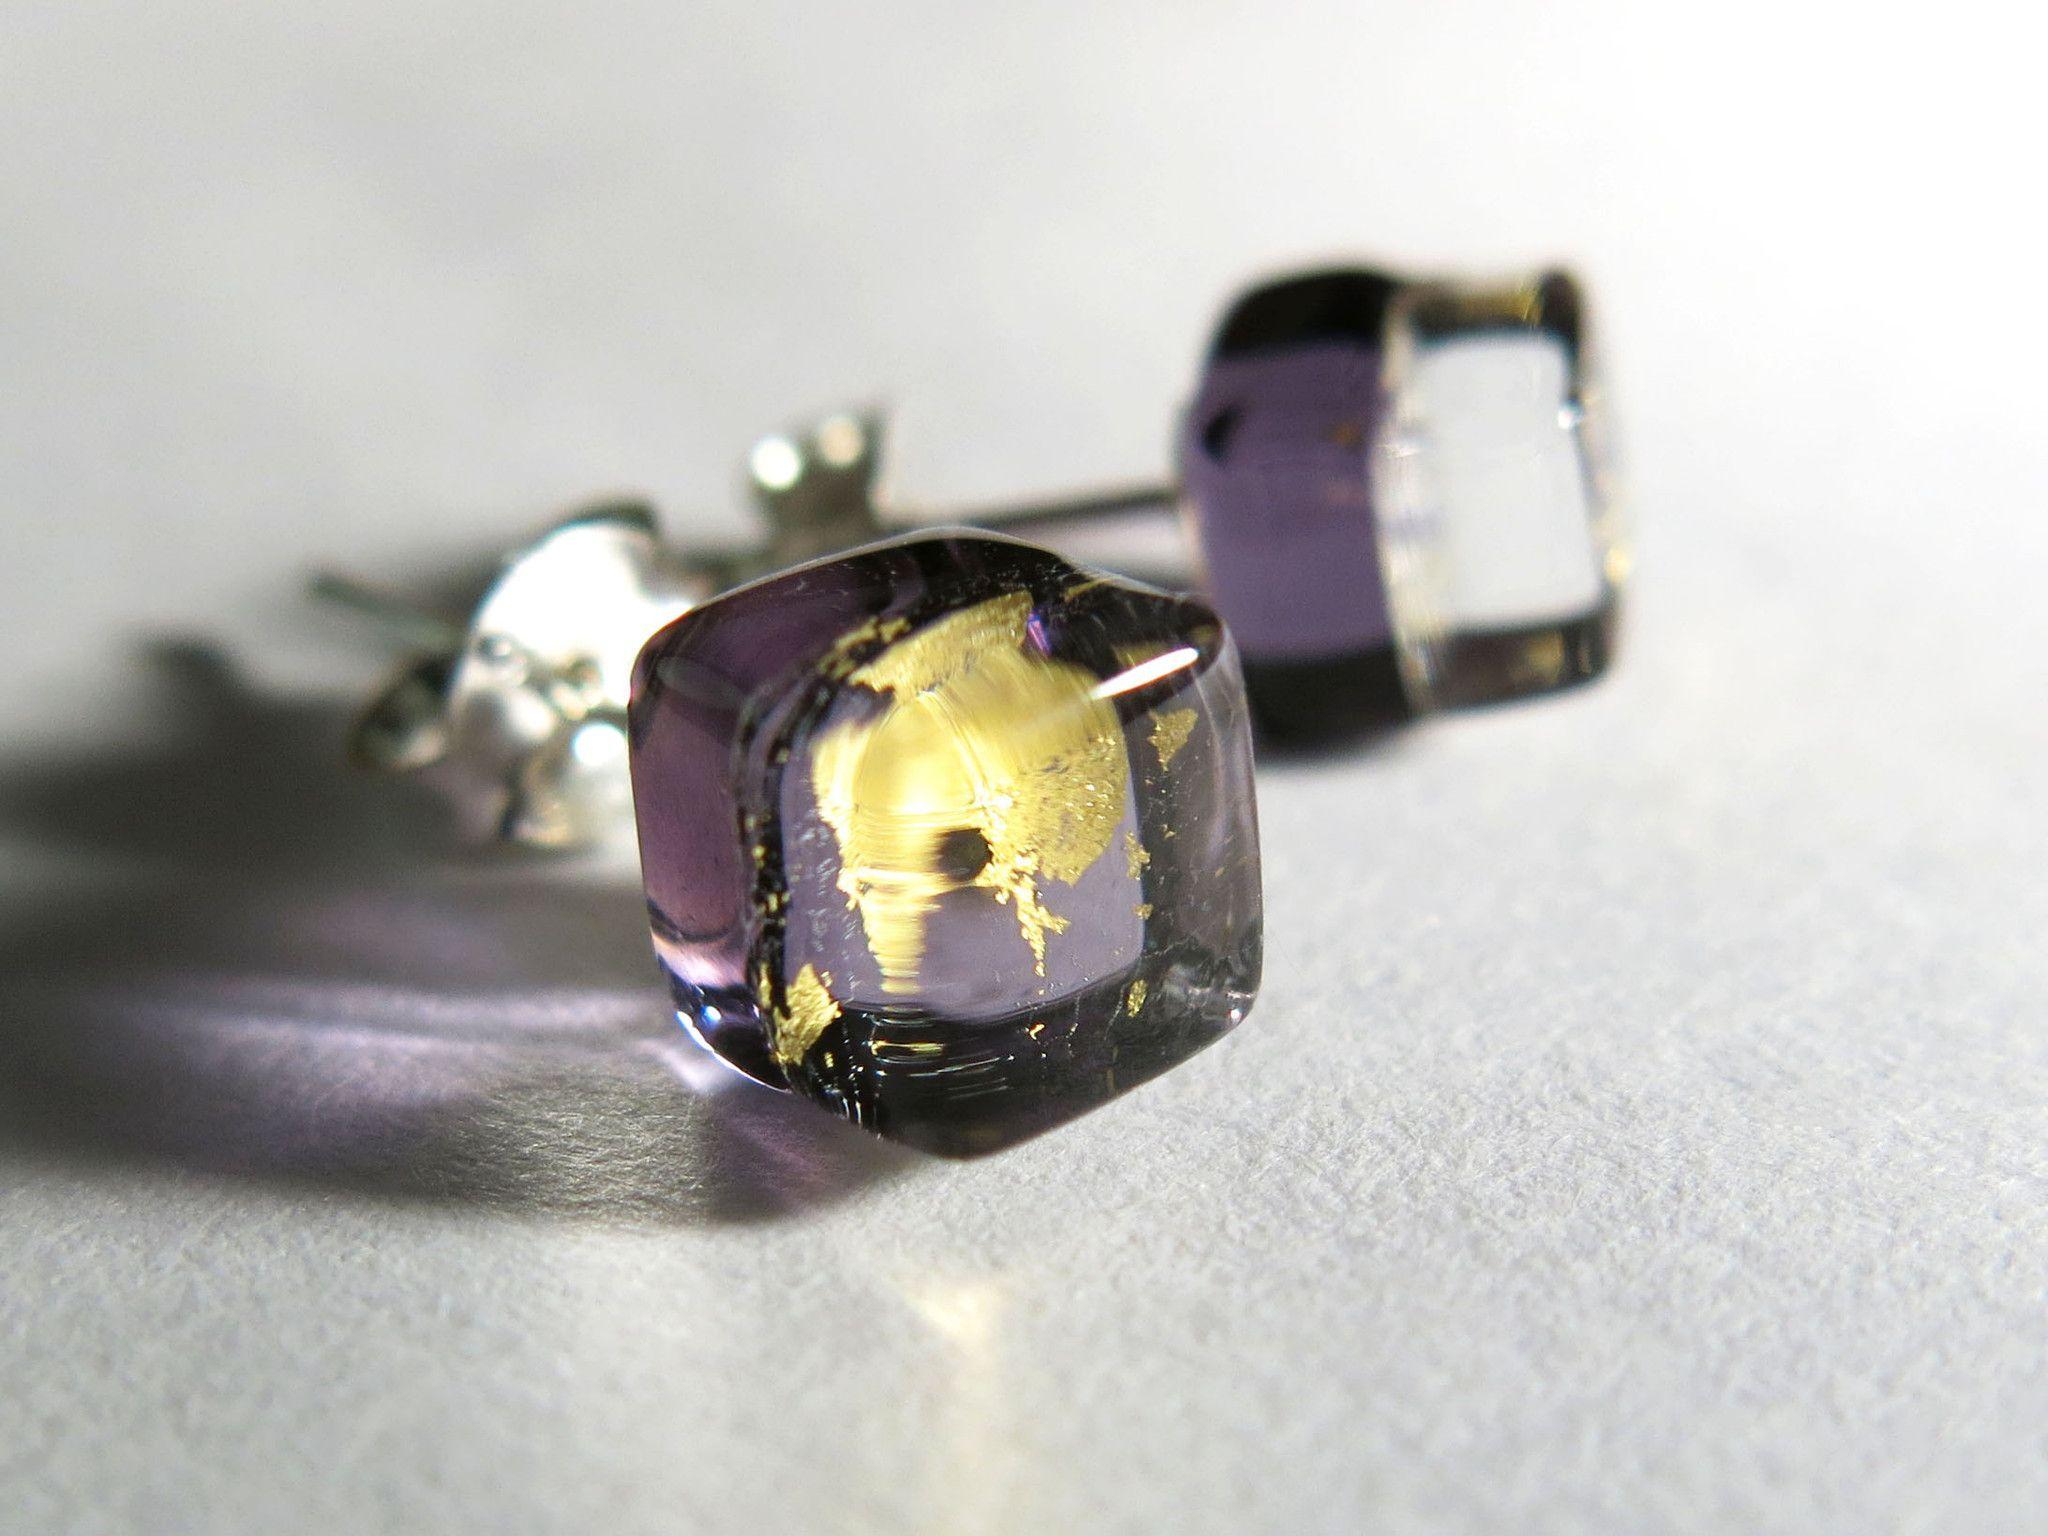 Handmade Liuli Glass Art- Ice Square (Purple Gold)- Artisan Fused Glass Earrings- Sterling Silver